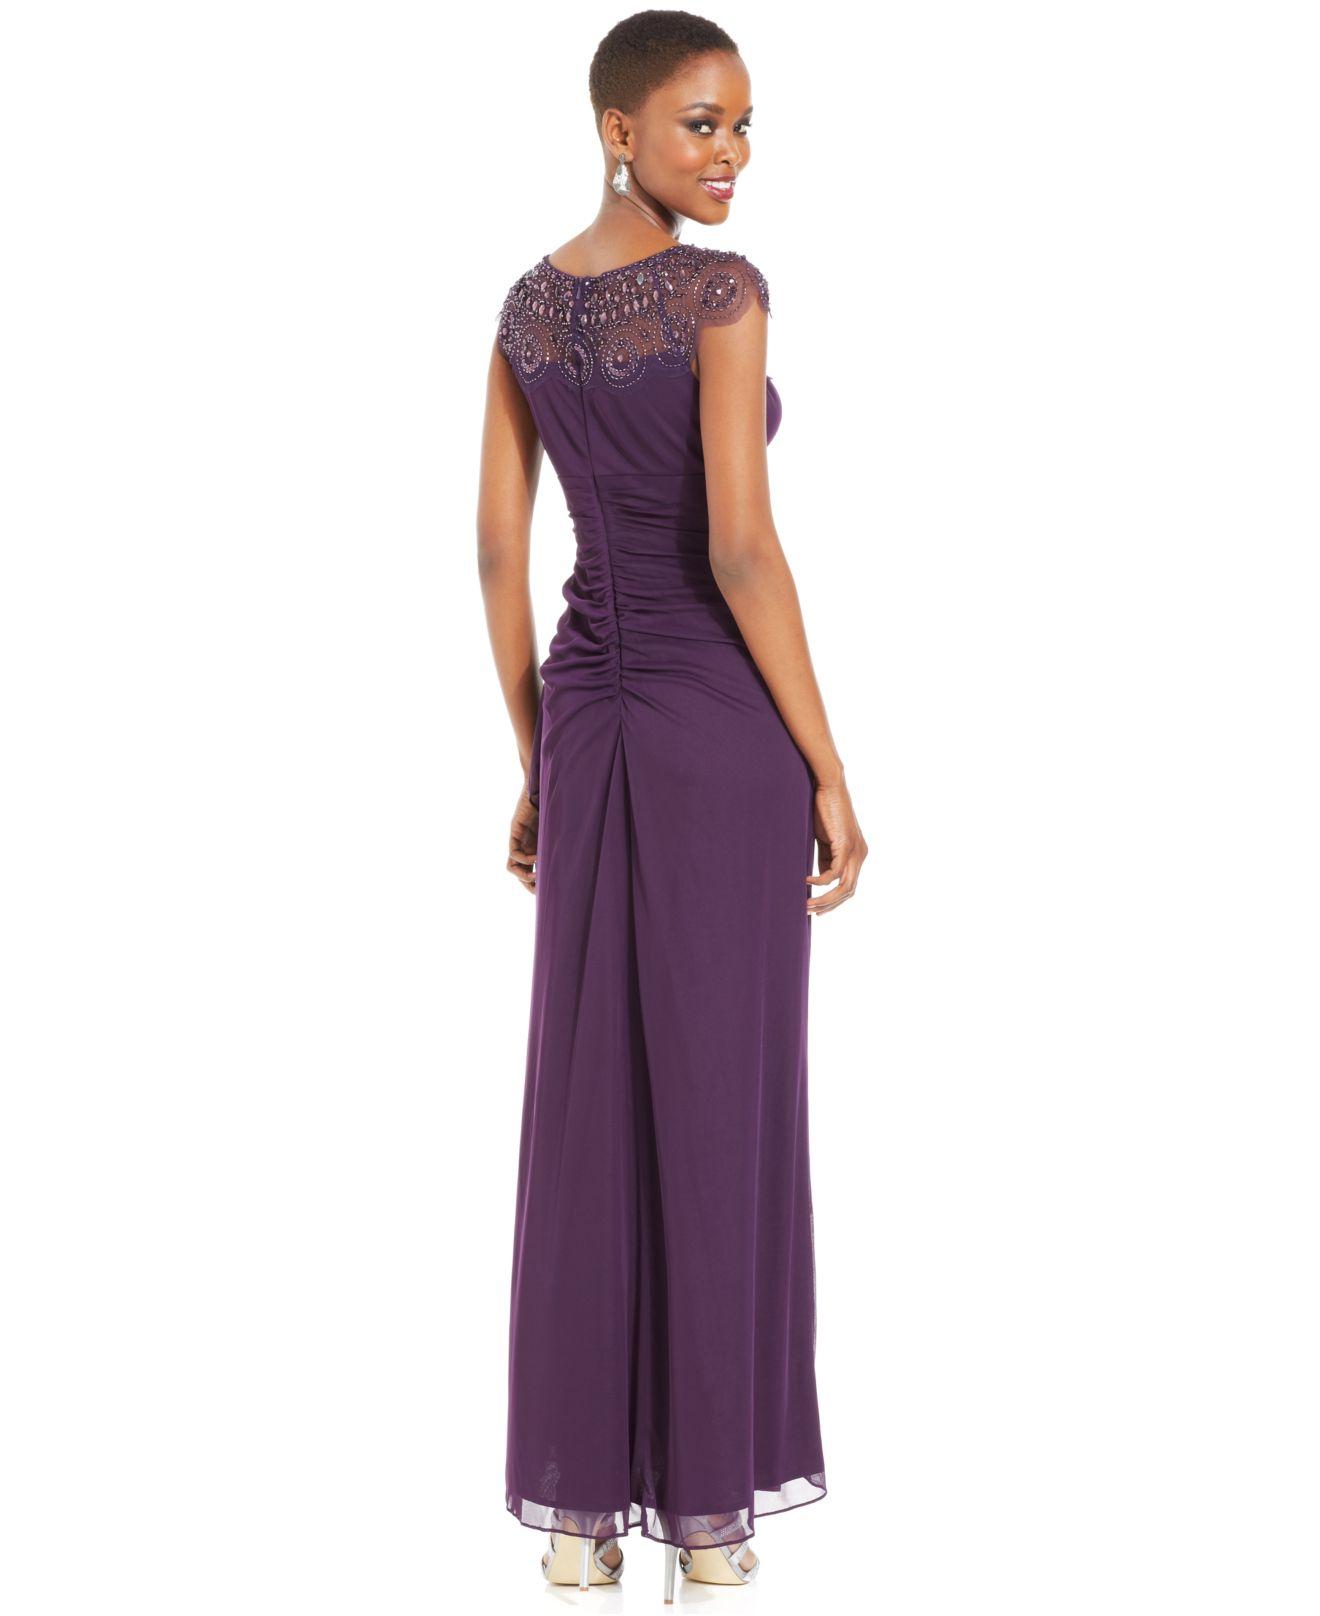 xscape cap sleeve illusion beaded dress | ivo hoogveld